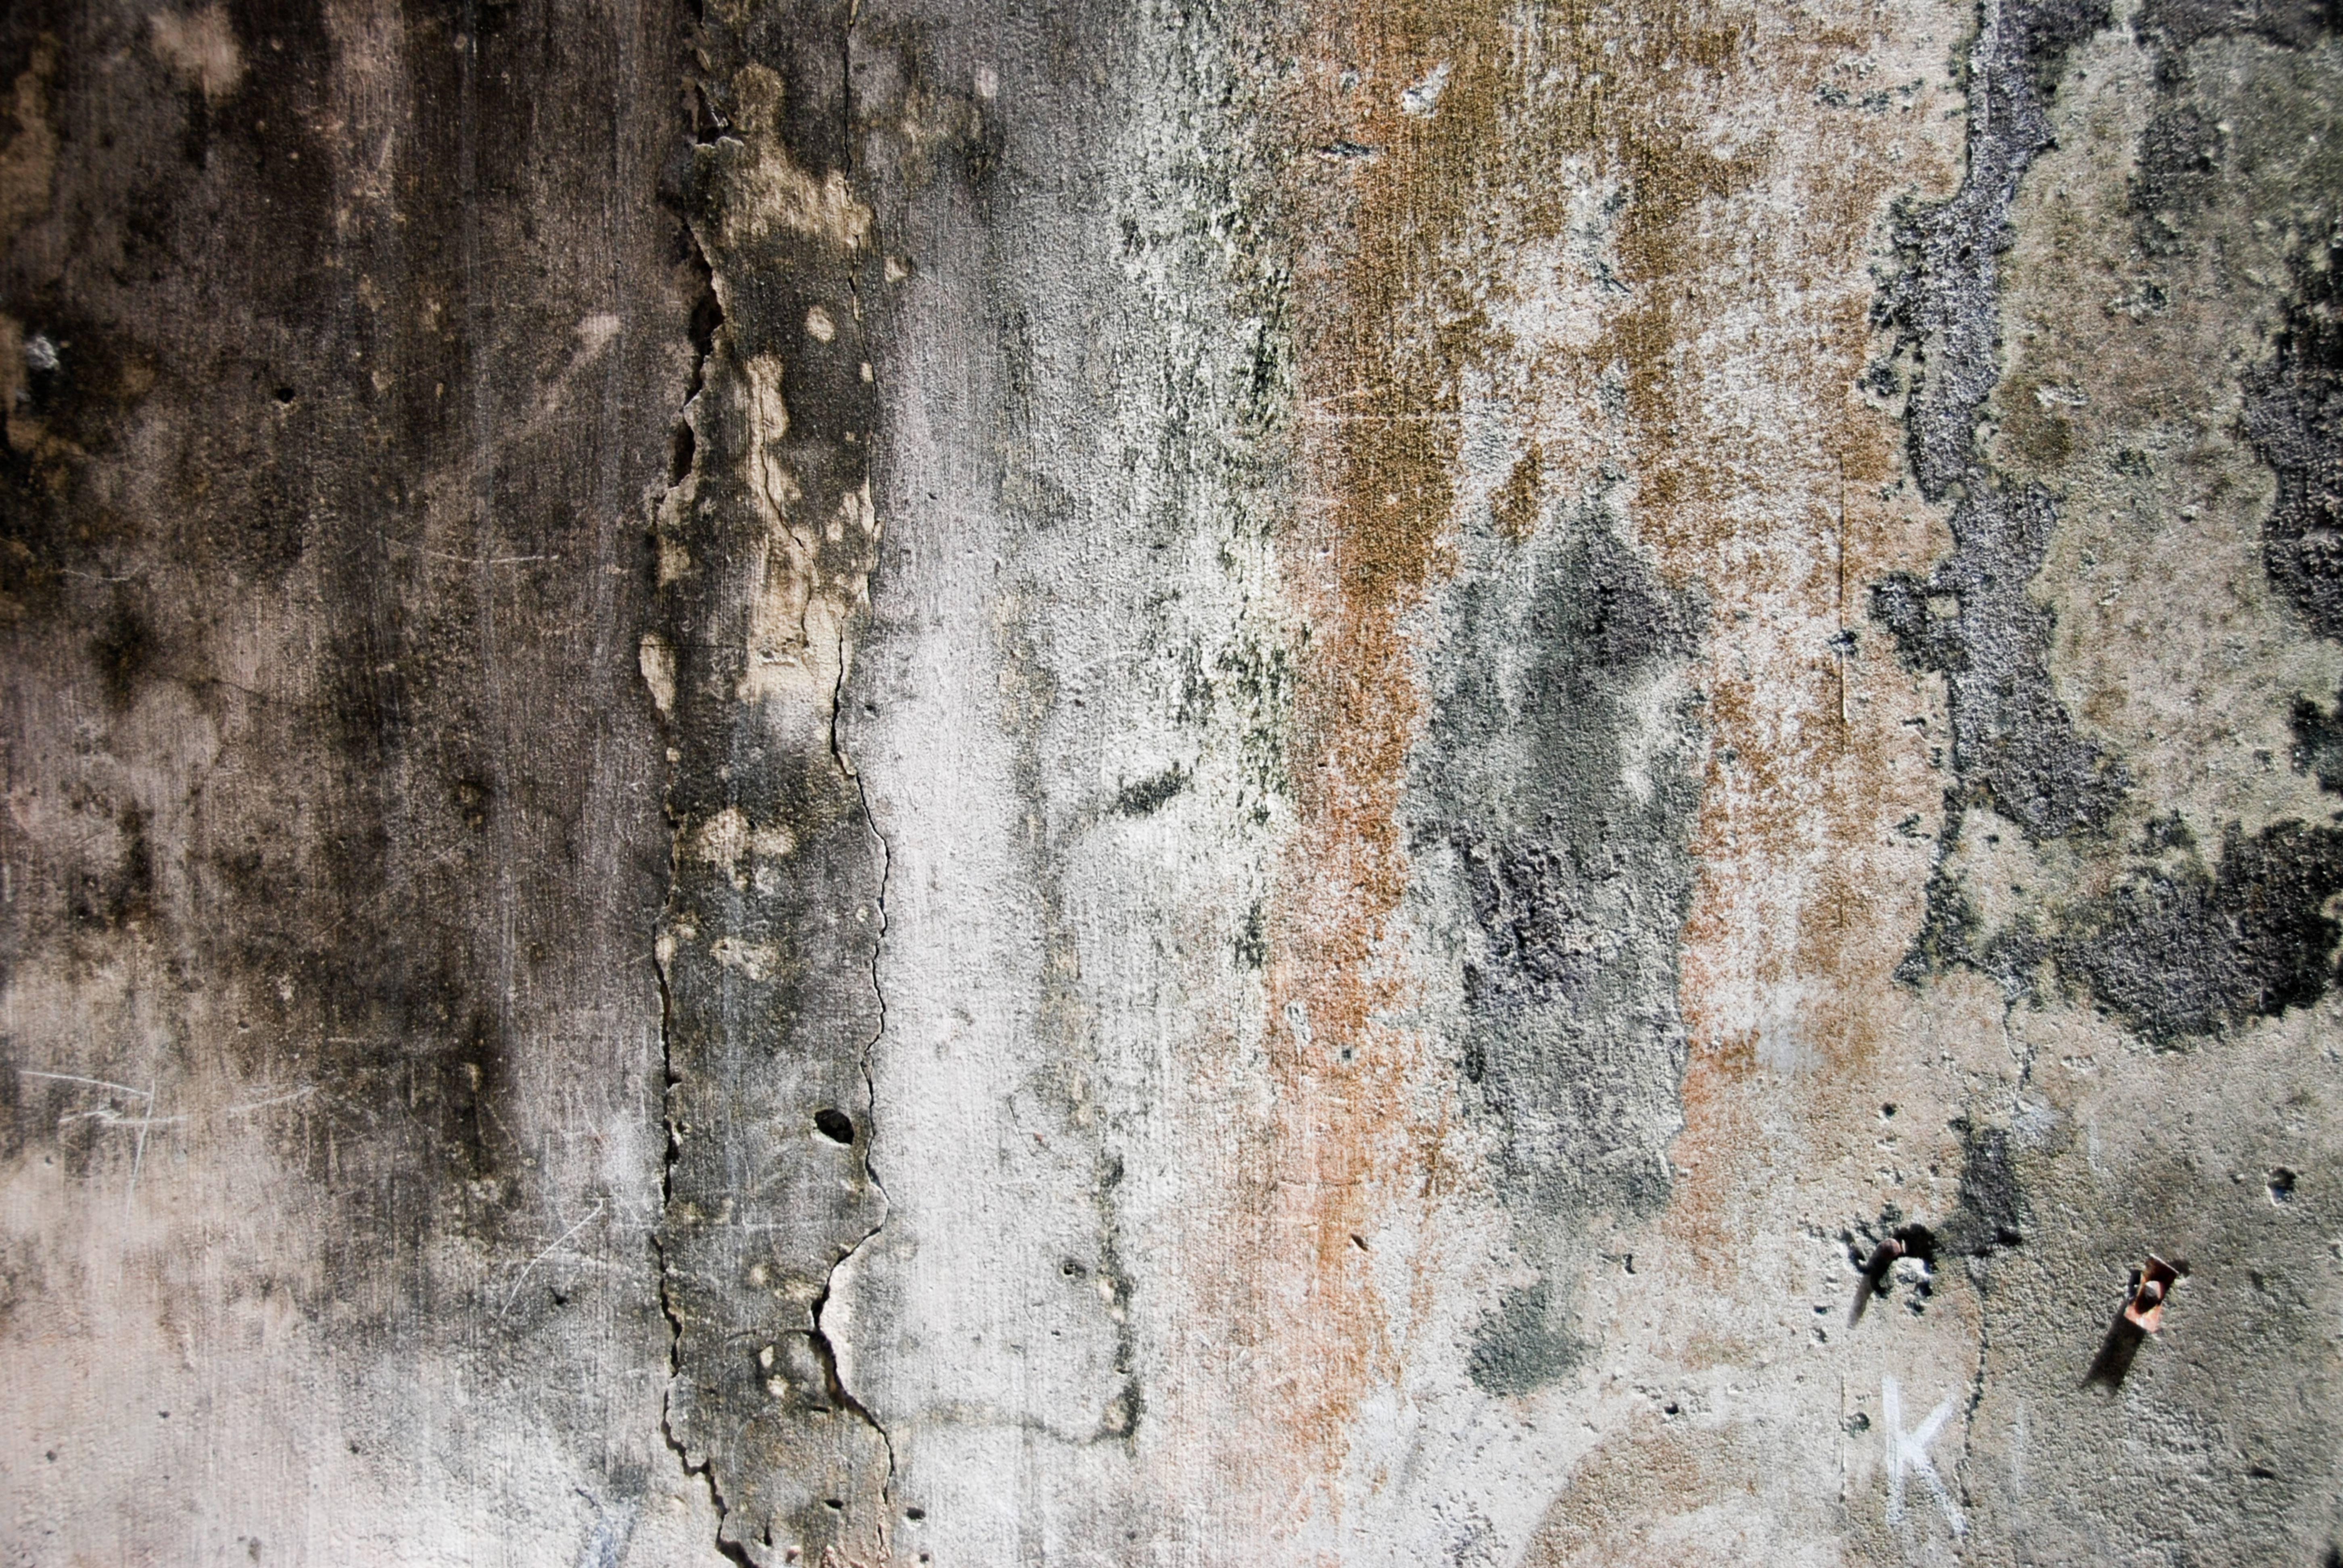 Grunge Concrete Wall